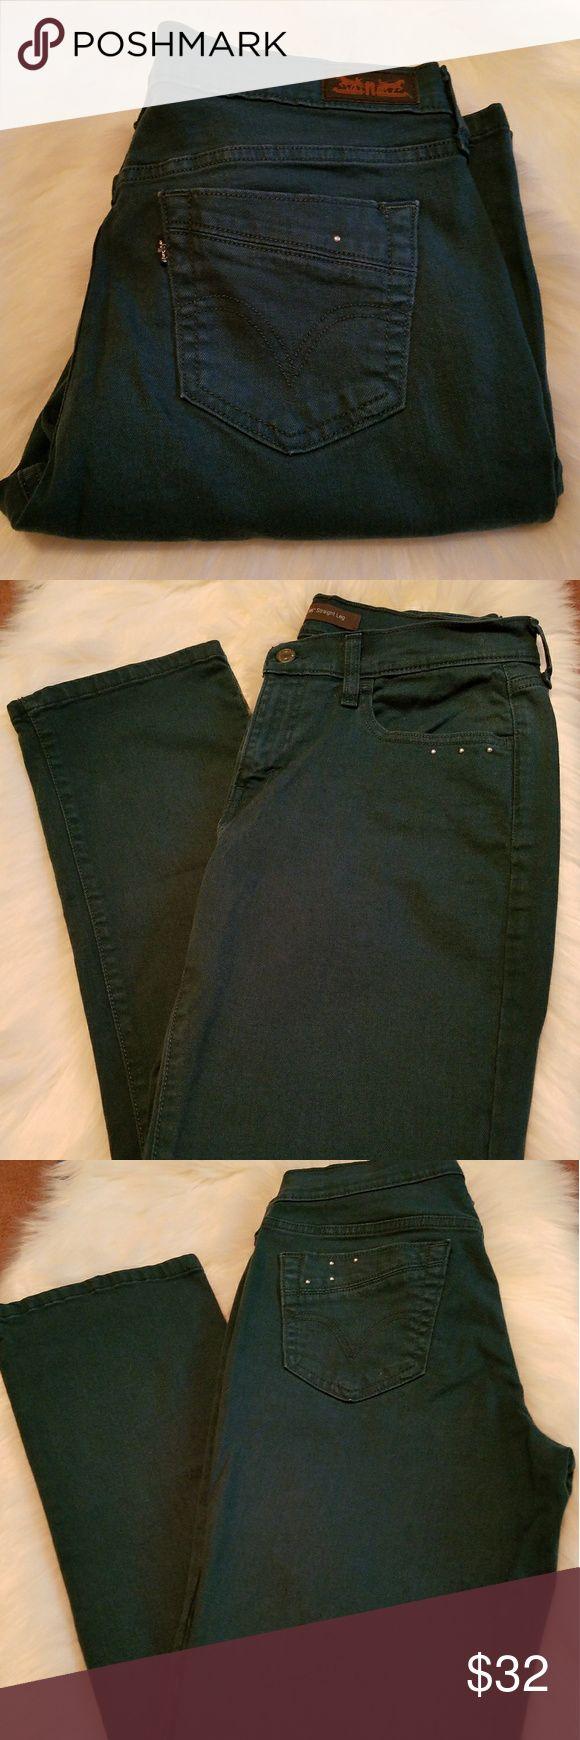 "Levis 505 Straight Leg Jeans Levis 505 Jeans Straight Leg Boot Cut Color- Hunter Green Size 8  Waist 29"" Length 32"" Excellent Used Condition Levi's Jeans Boot Cut"